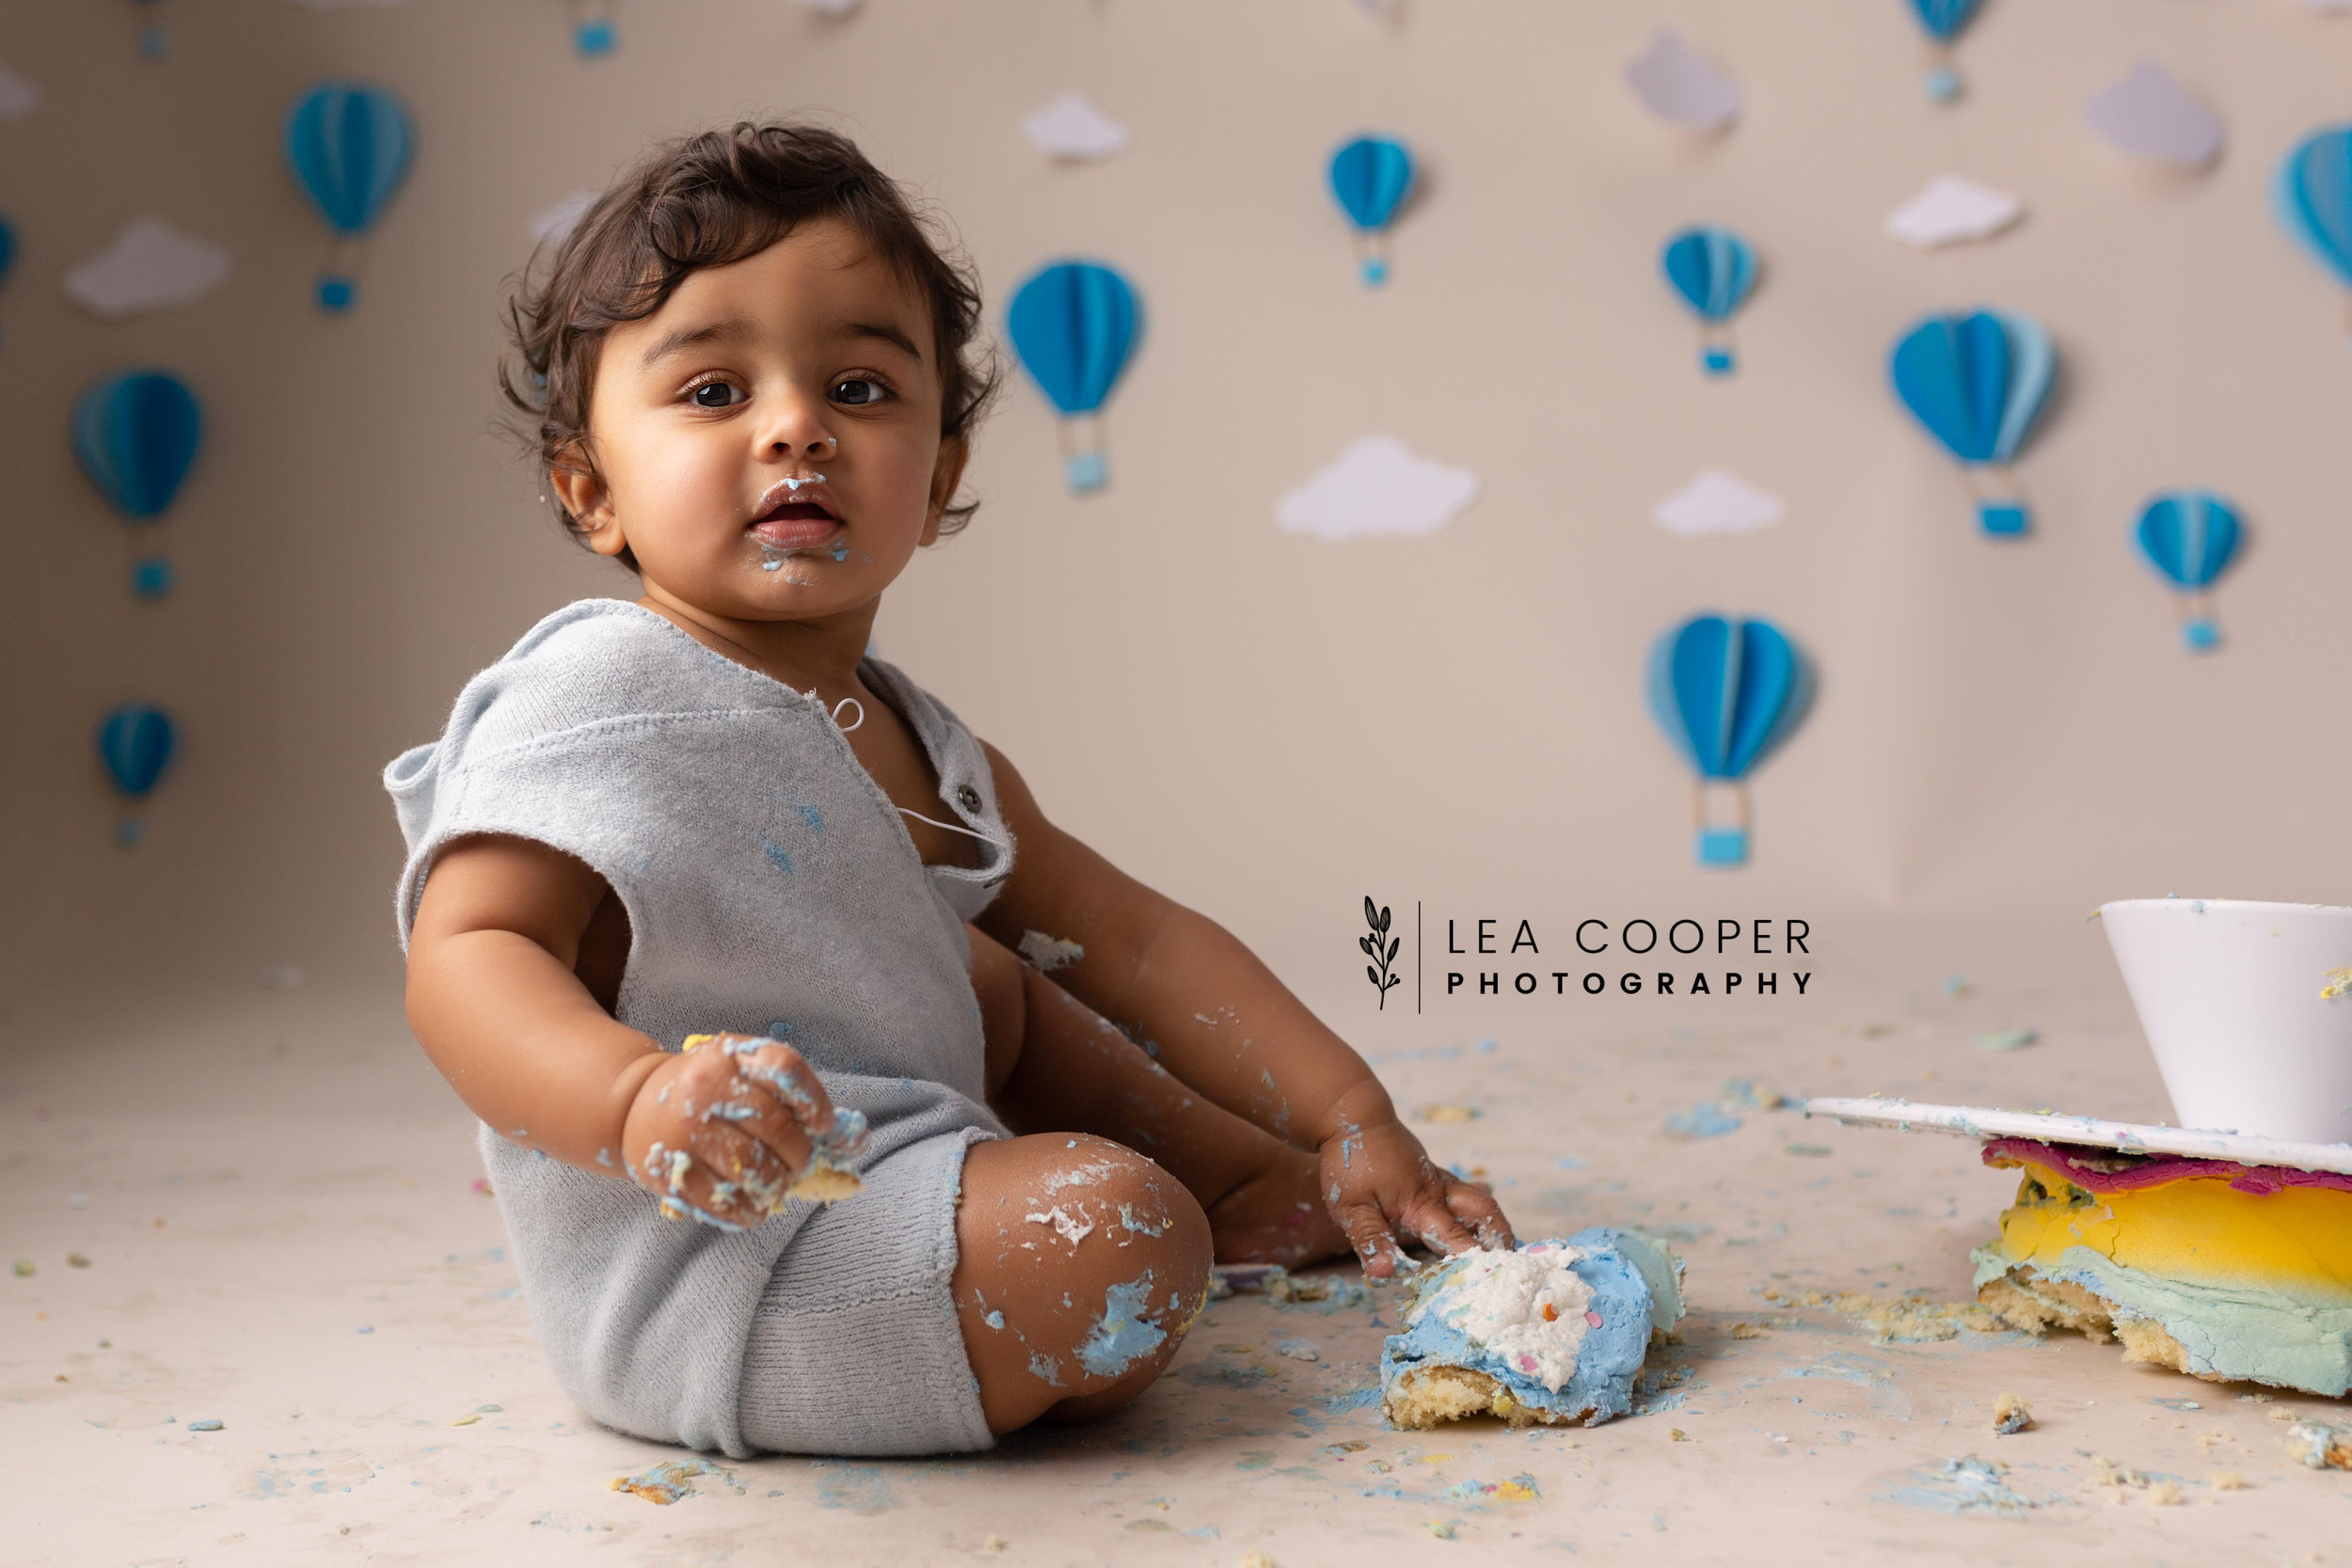 LEA-COOPER-PHOTOGRAPHY-CAKE-SMASH-PHOTOGRAPHER-WILLENALL-WOLVERHAMPTON-CHILD-PHOTOSHOOT-1ST—BIRTHDAY-PICTURES-WEDNESBURY-WALSALL-DUDLEY-WEST-MIDLANDS-UK-29.JPG